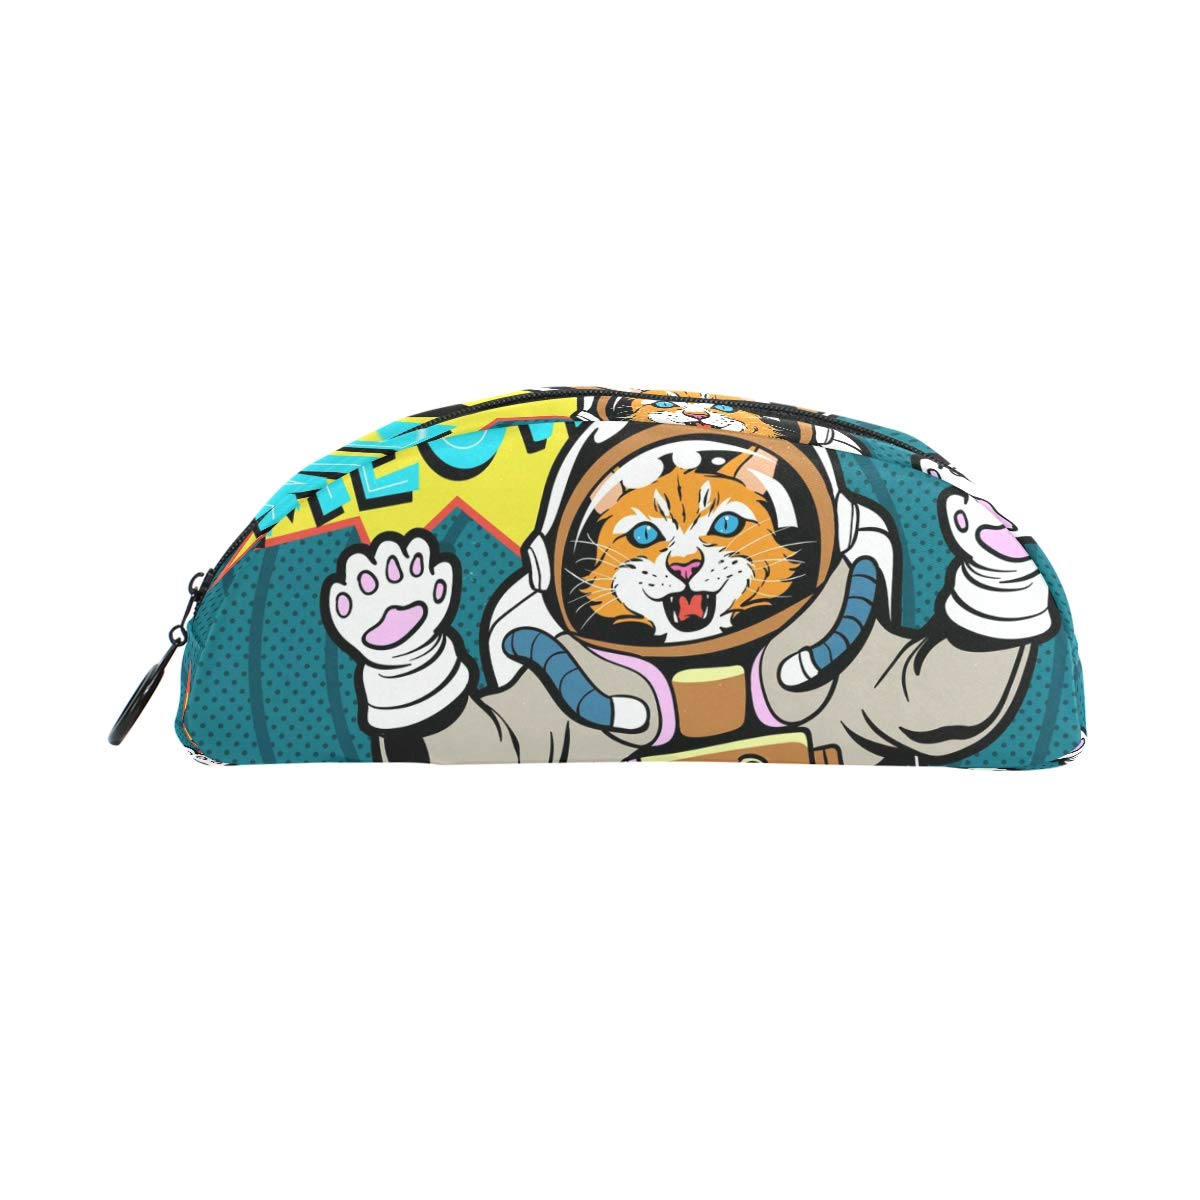 Cat Astronaut - Estuche para bolígrafos de escuela, de tamaño grande, caja de escuela, maquillaje, cosméticos, oficina, bolsa de viaje 68980e